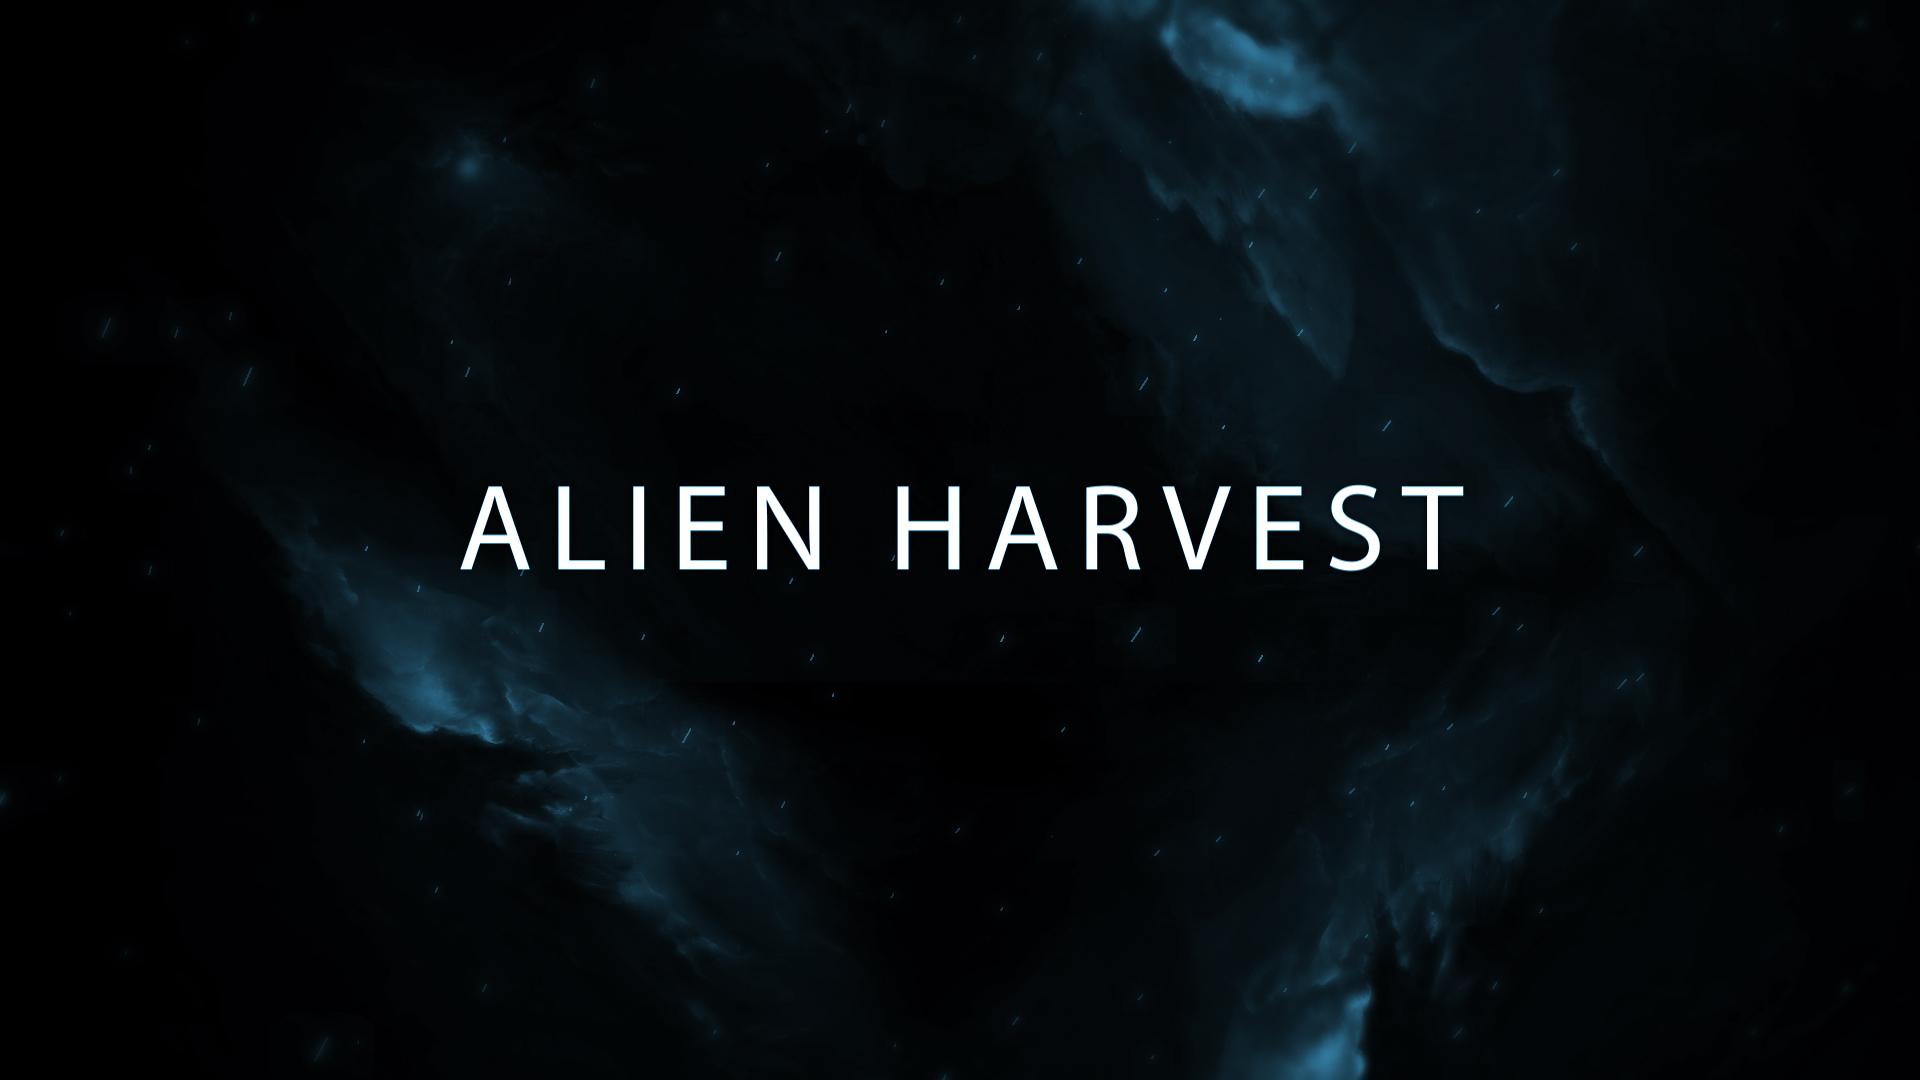 Alien Harvest Imdb